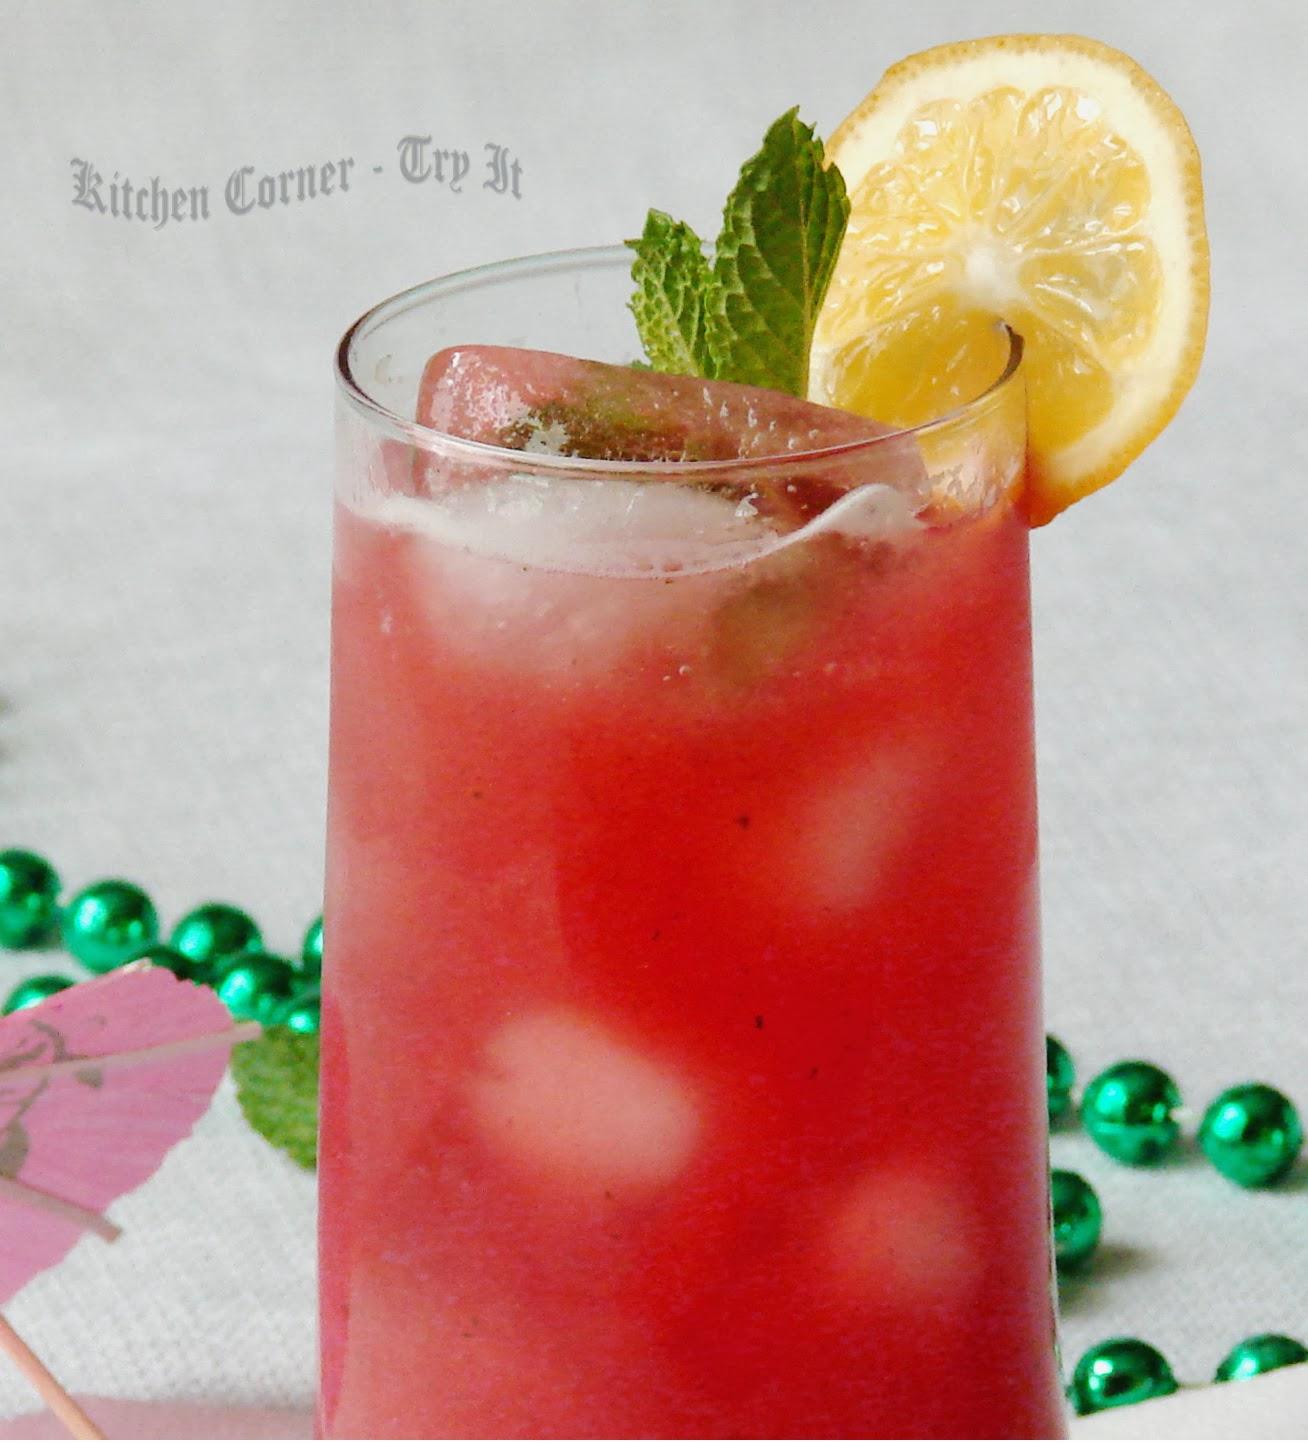 Kitchen Corner-Try It: Raspberry Mint Agua Fresca